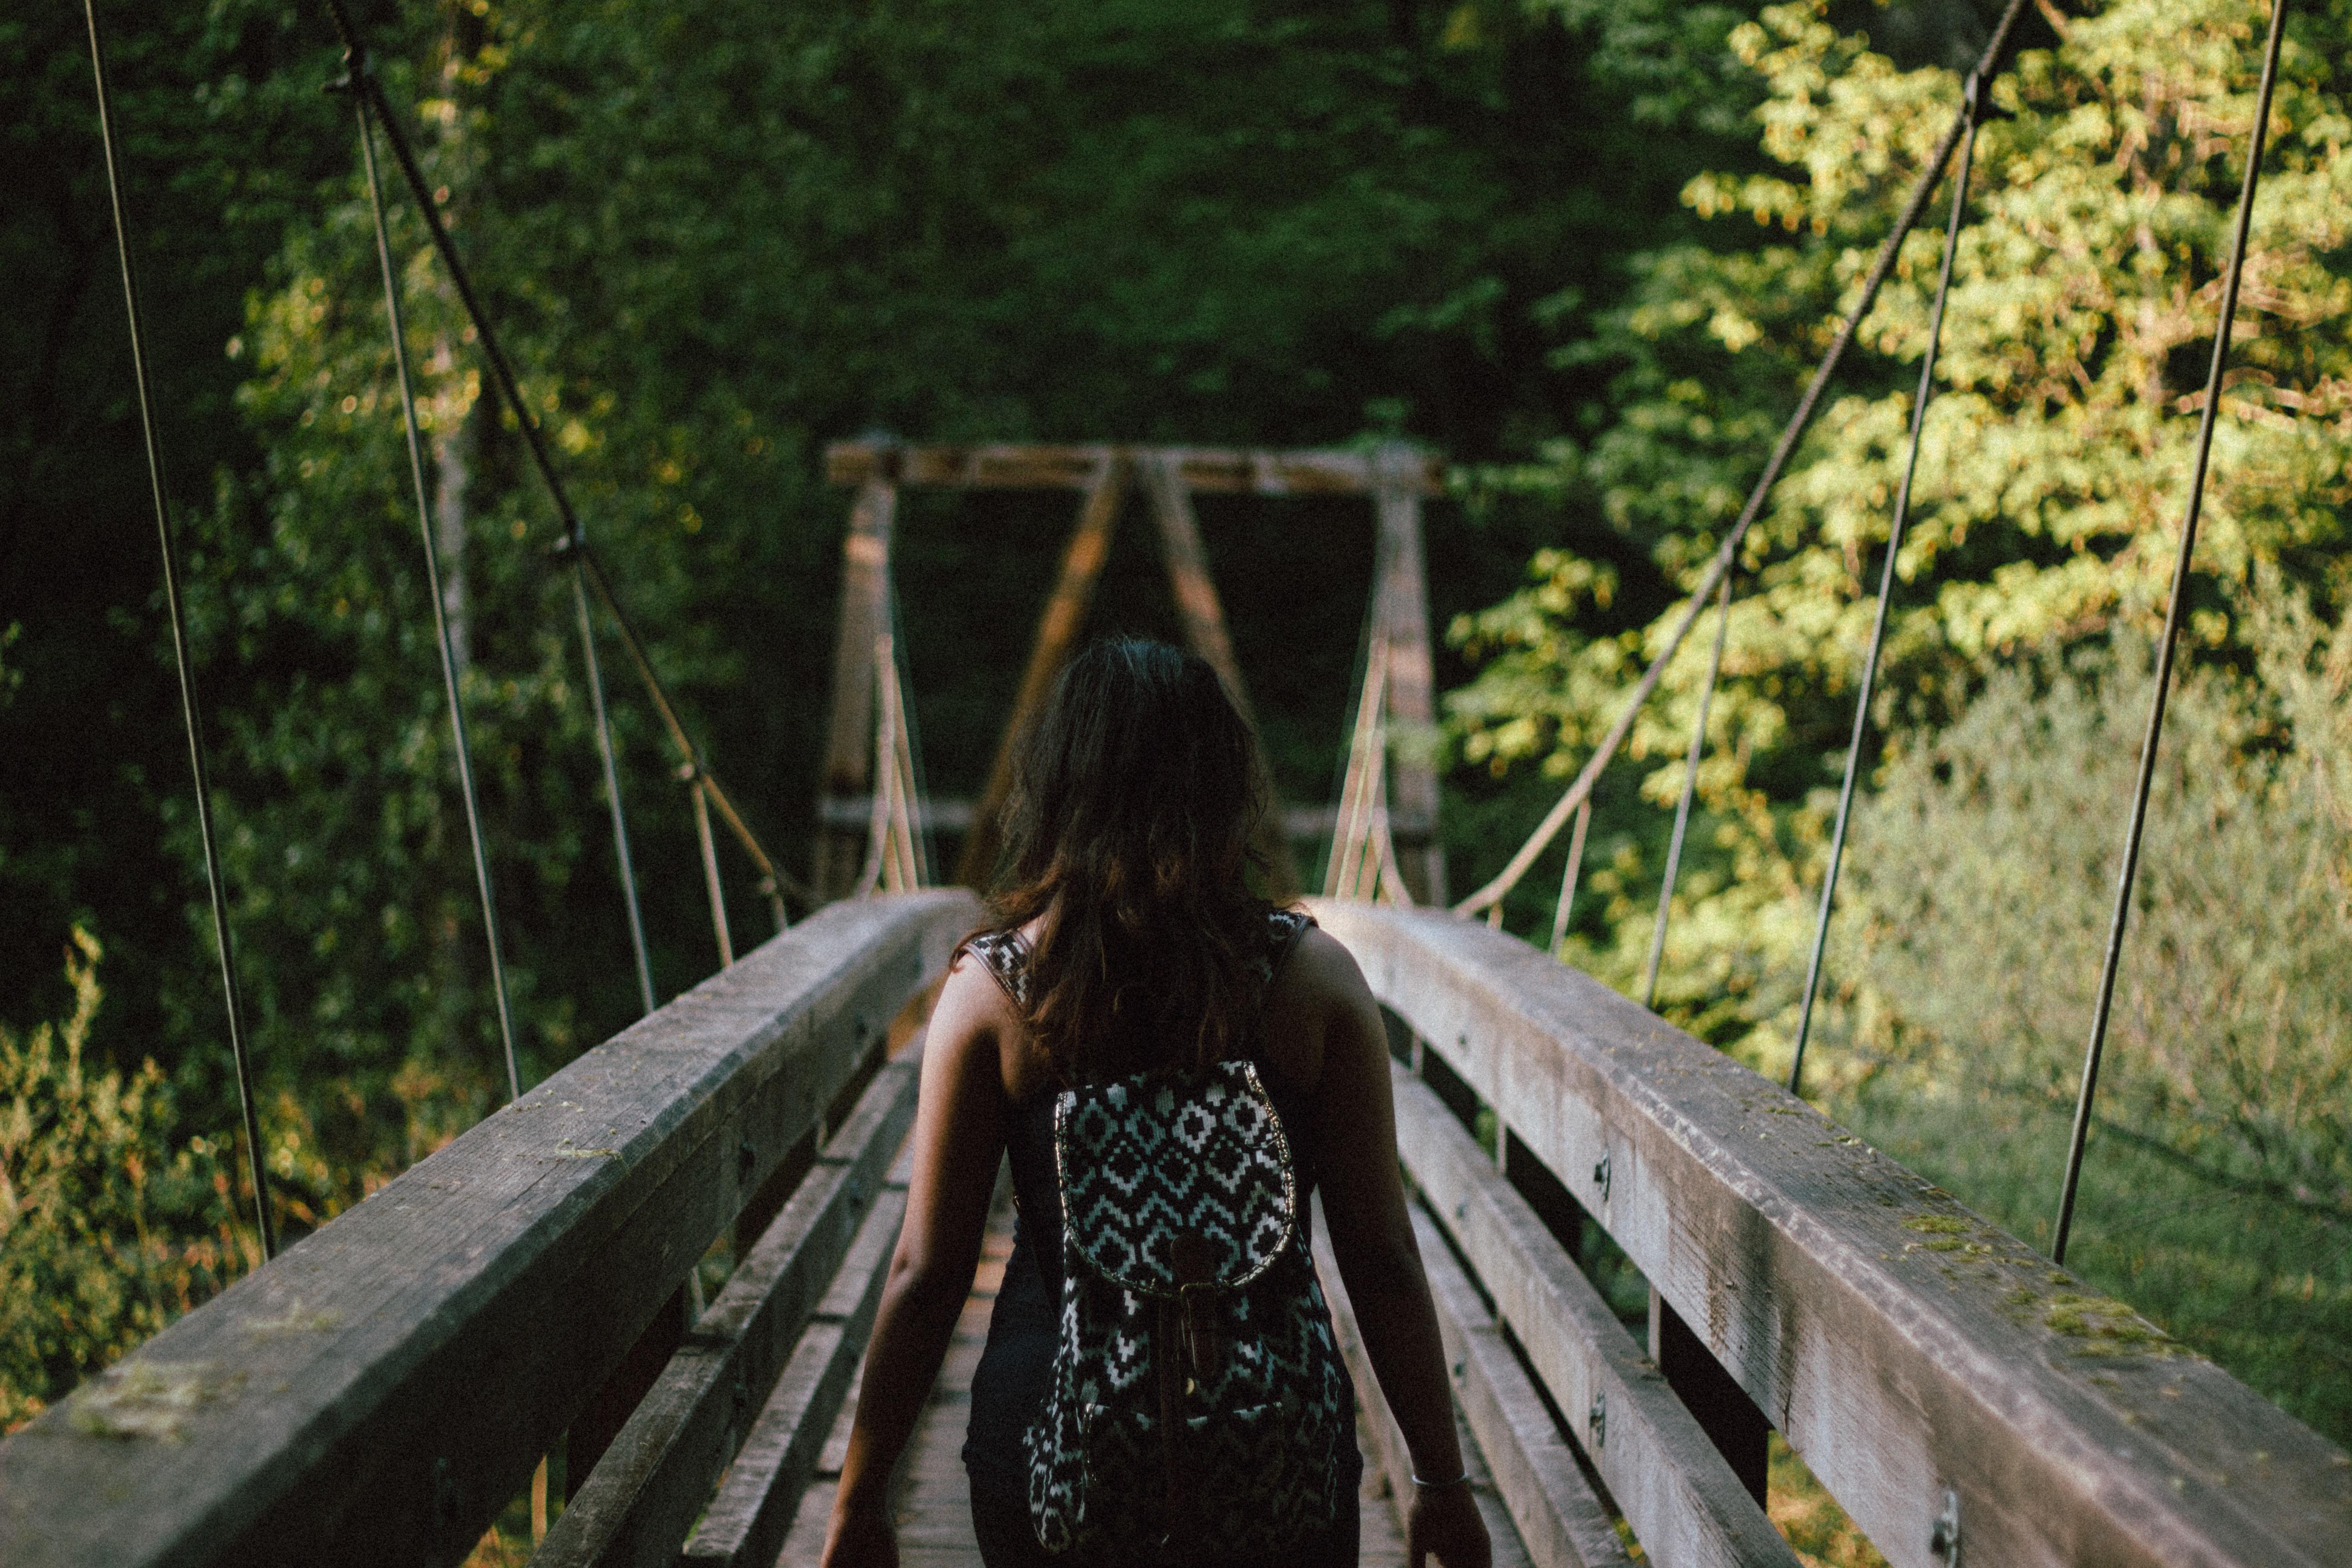 It's Time to Cross Your Bridge